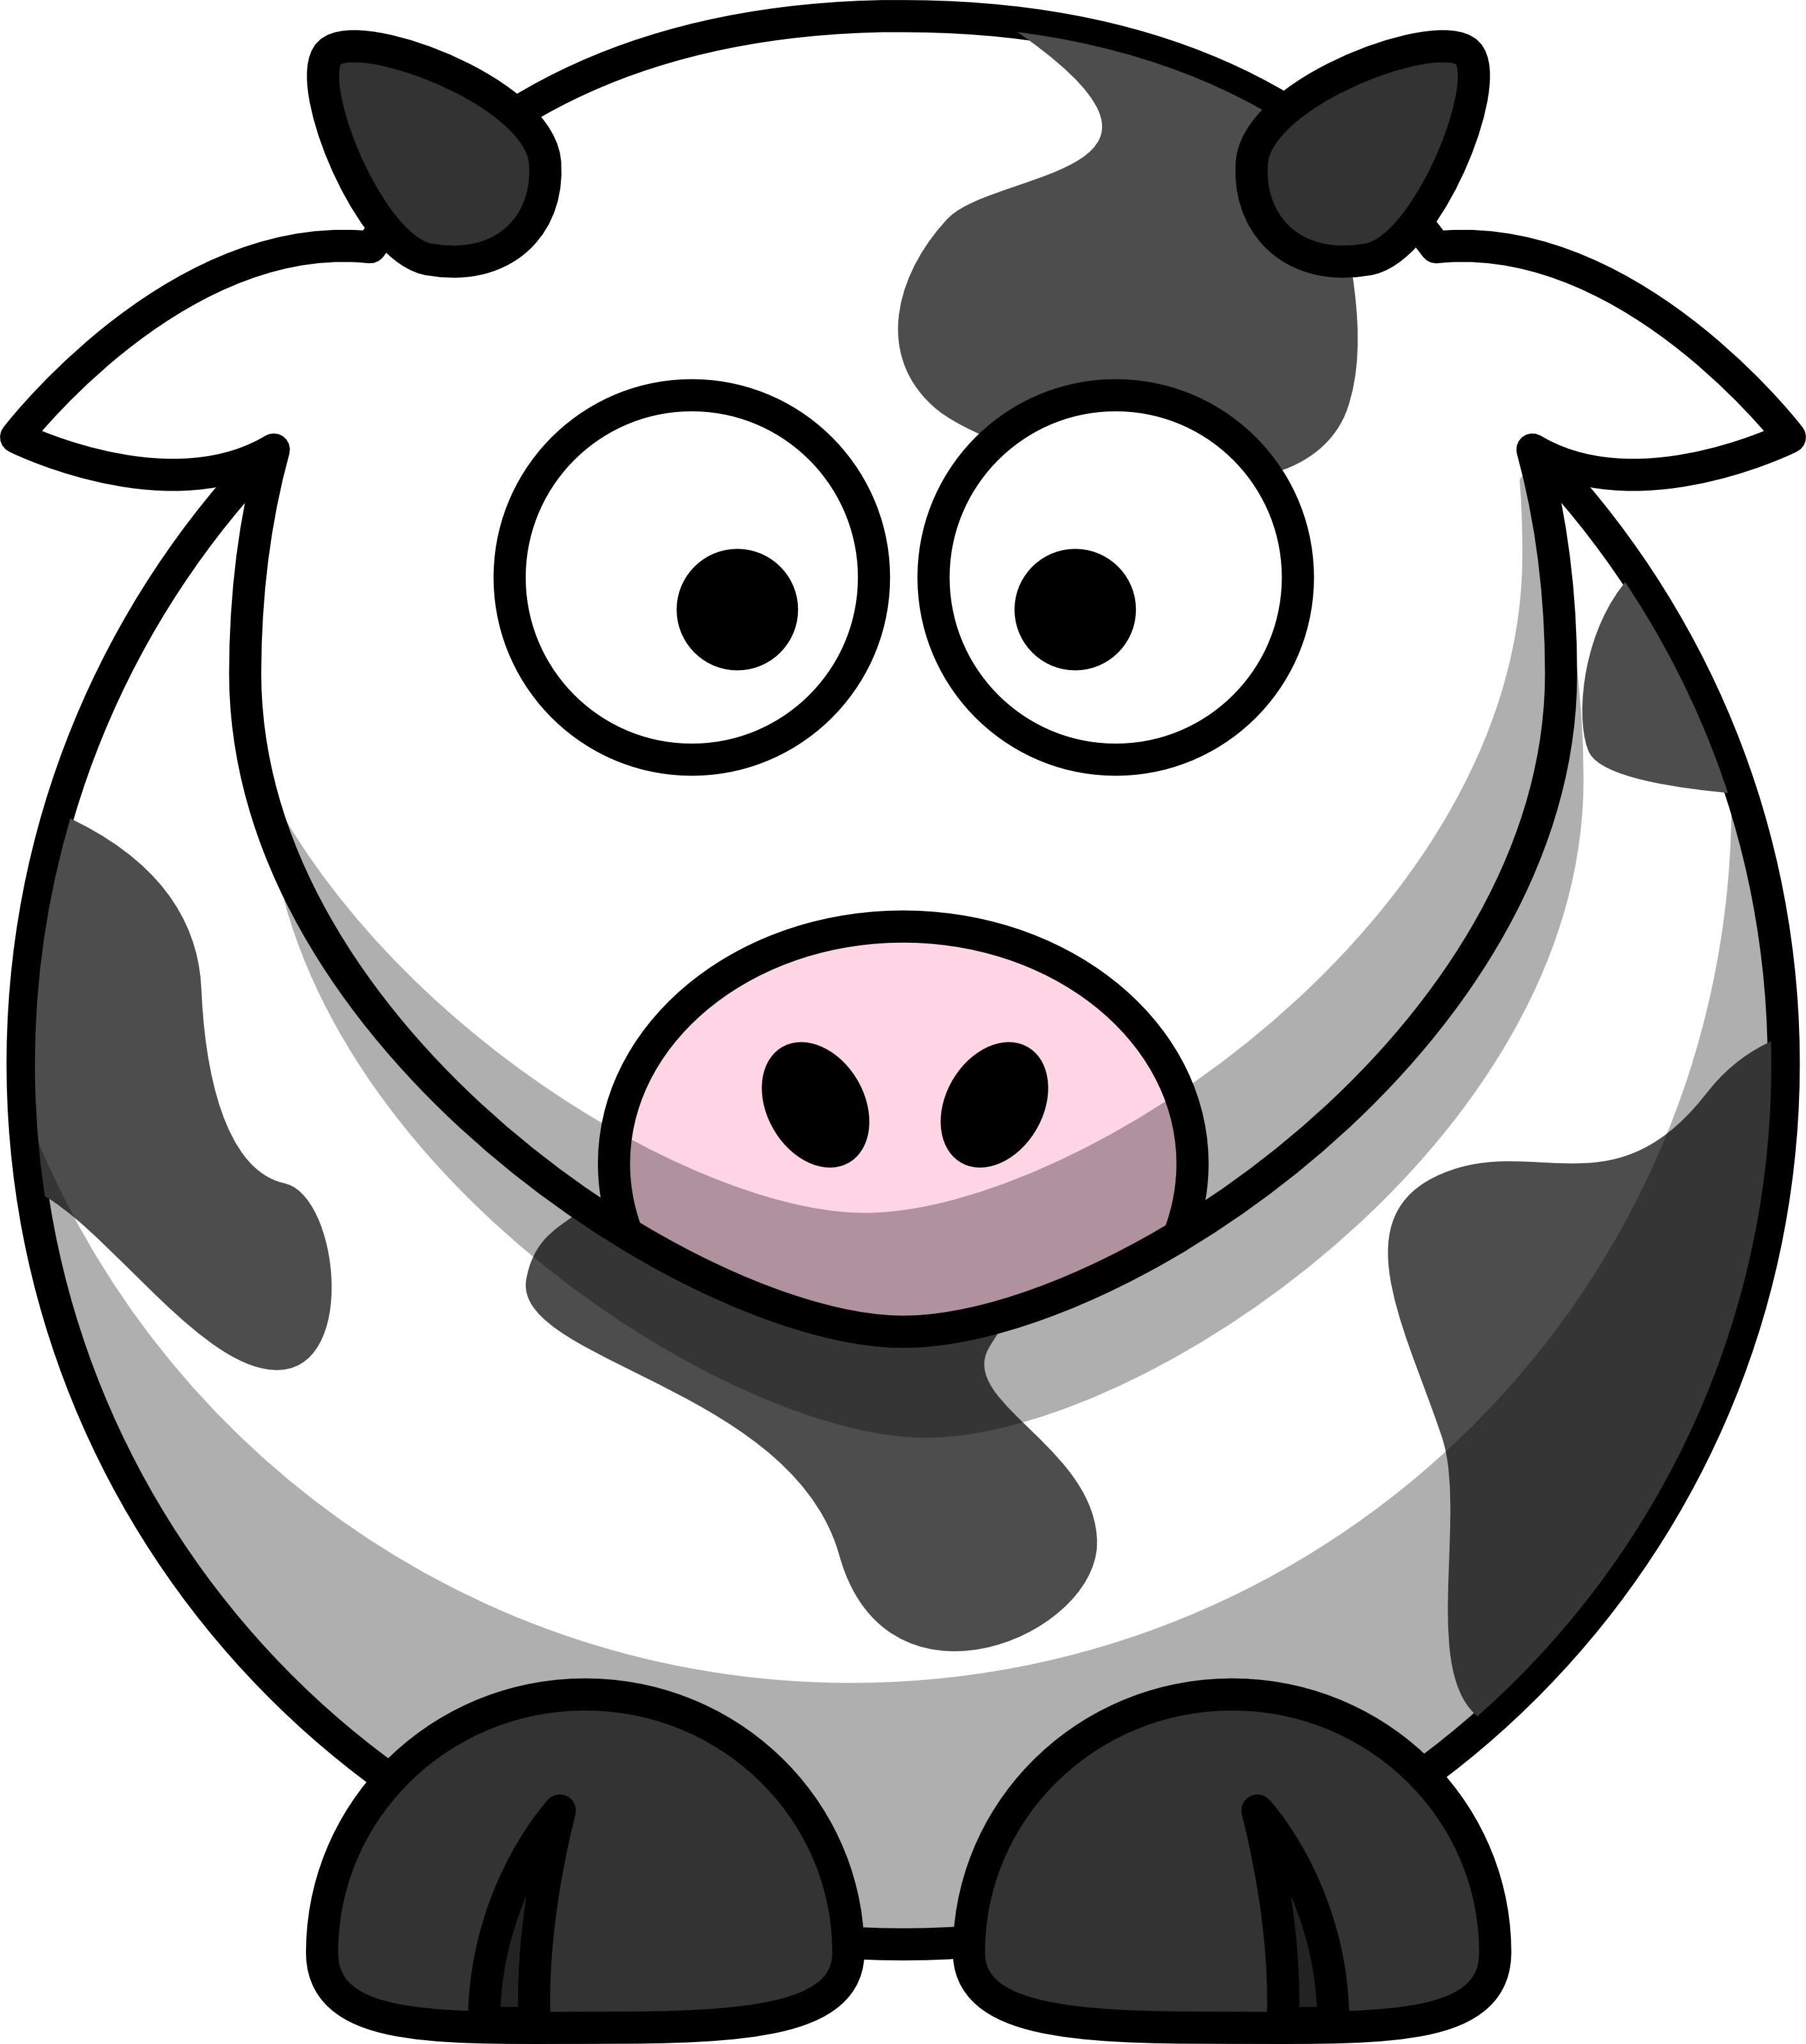 Free Cartoon Cow Clip Art By 000149 .-Free Cartoon Cow Clip Art by 000149 .-11